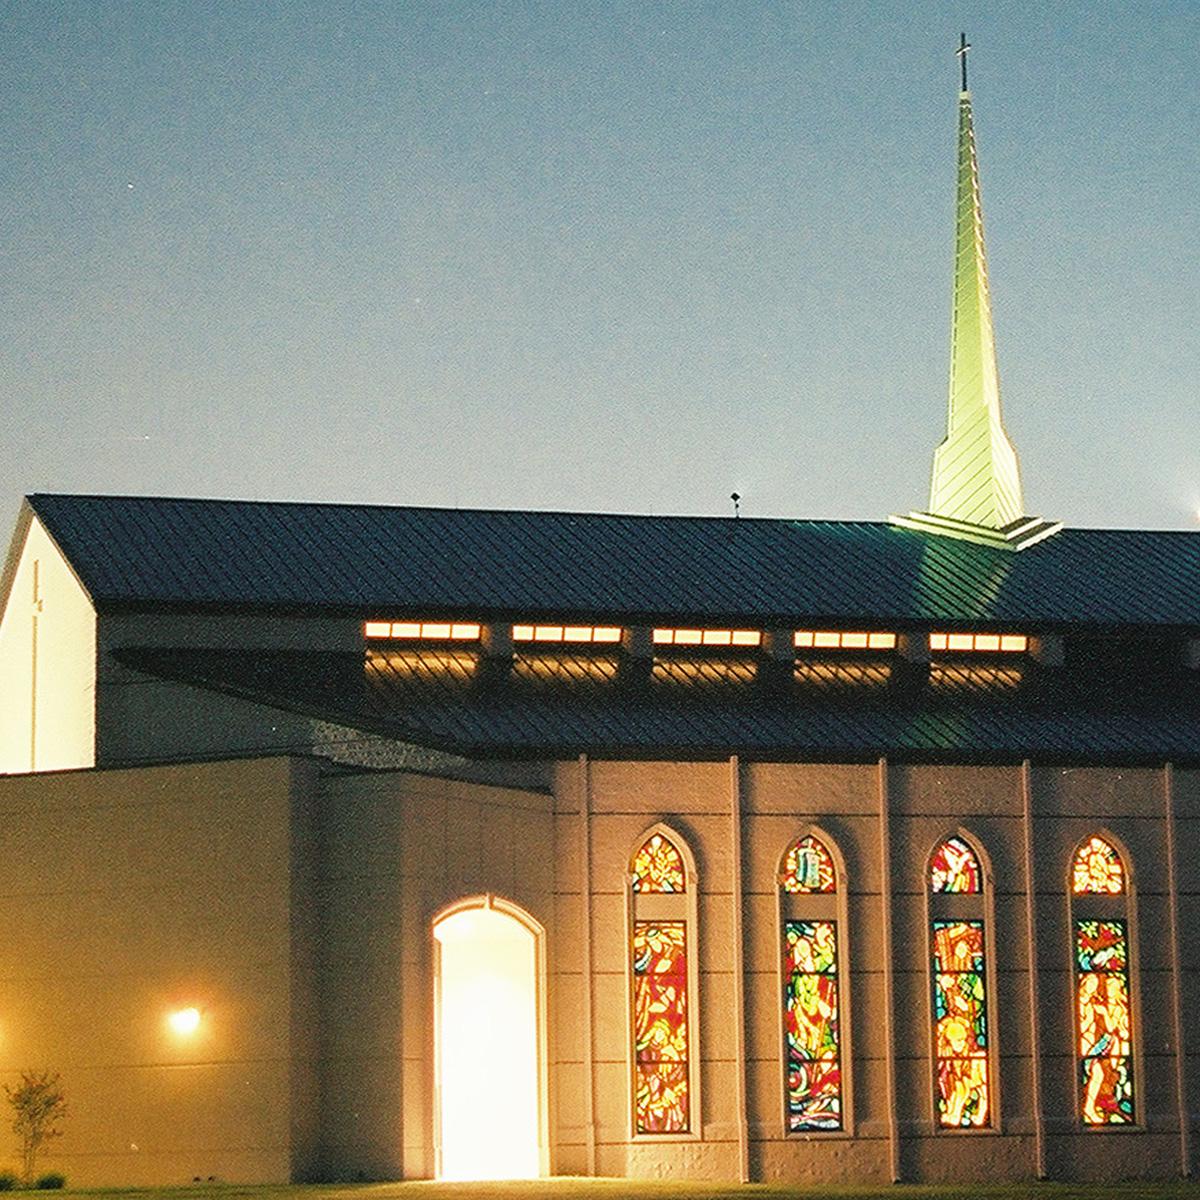 Church architectural construction